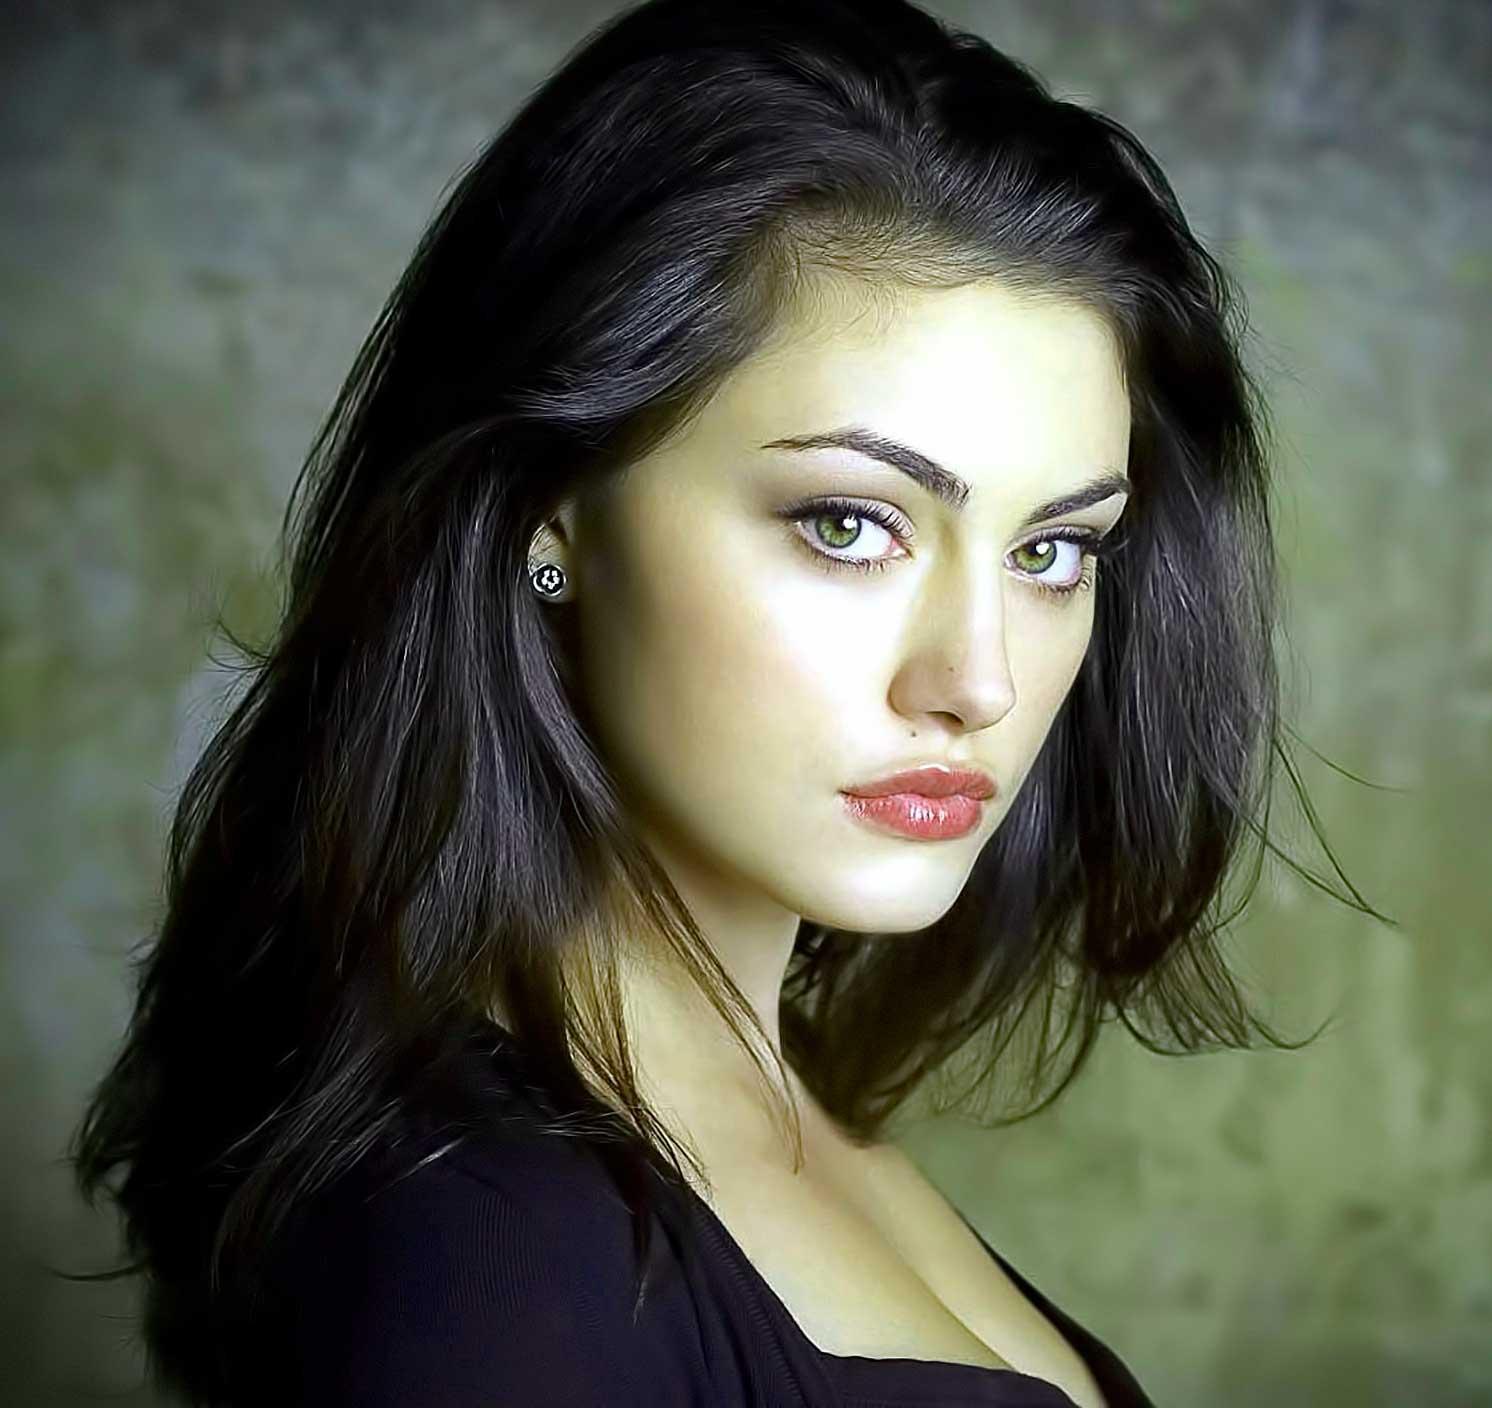 indian beautiful girl images Wallppaer Free